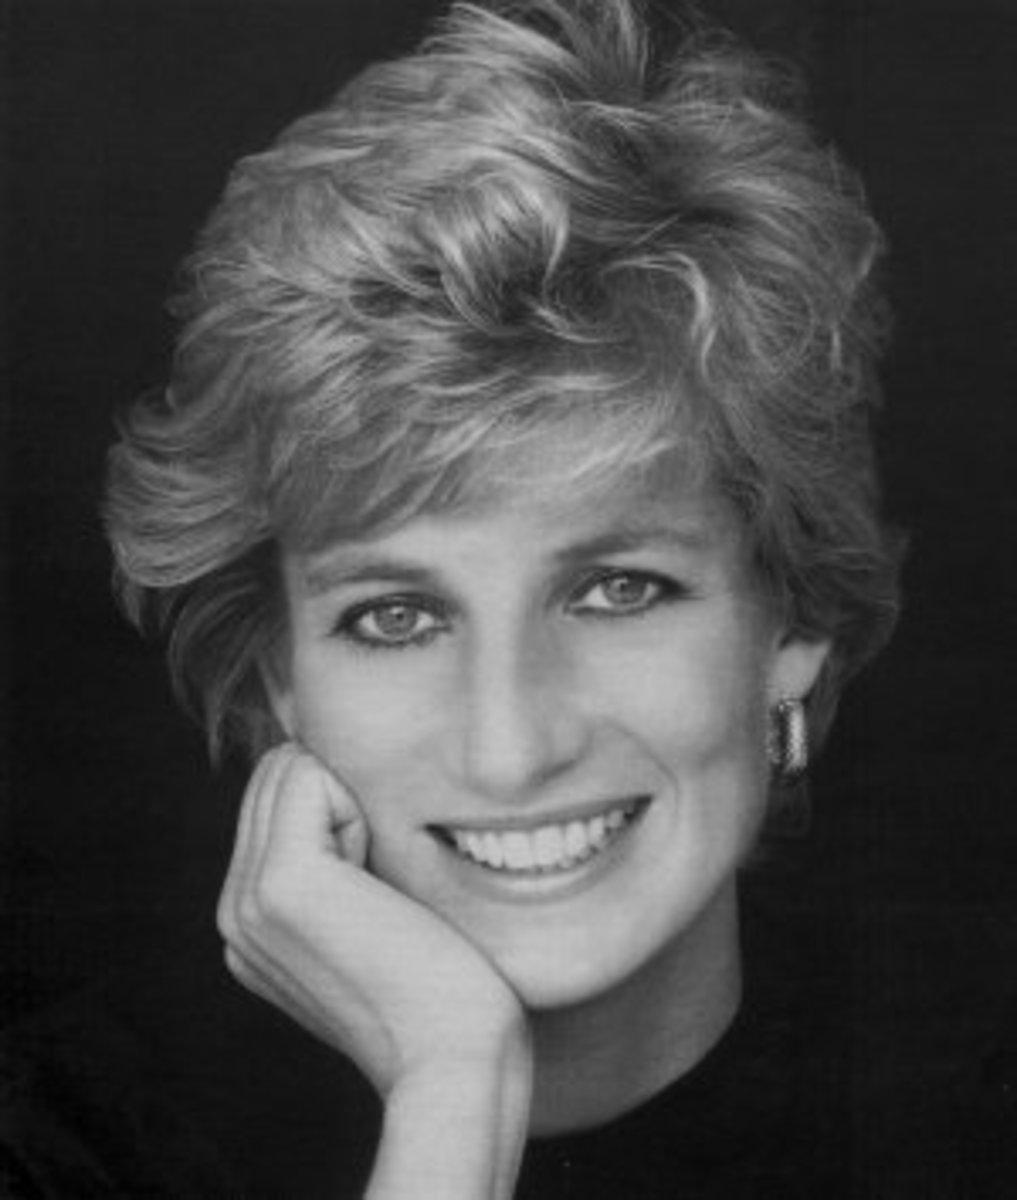 Princess Diana - A Pictorial History